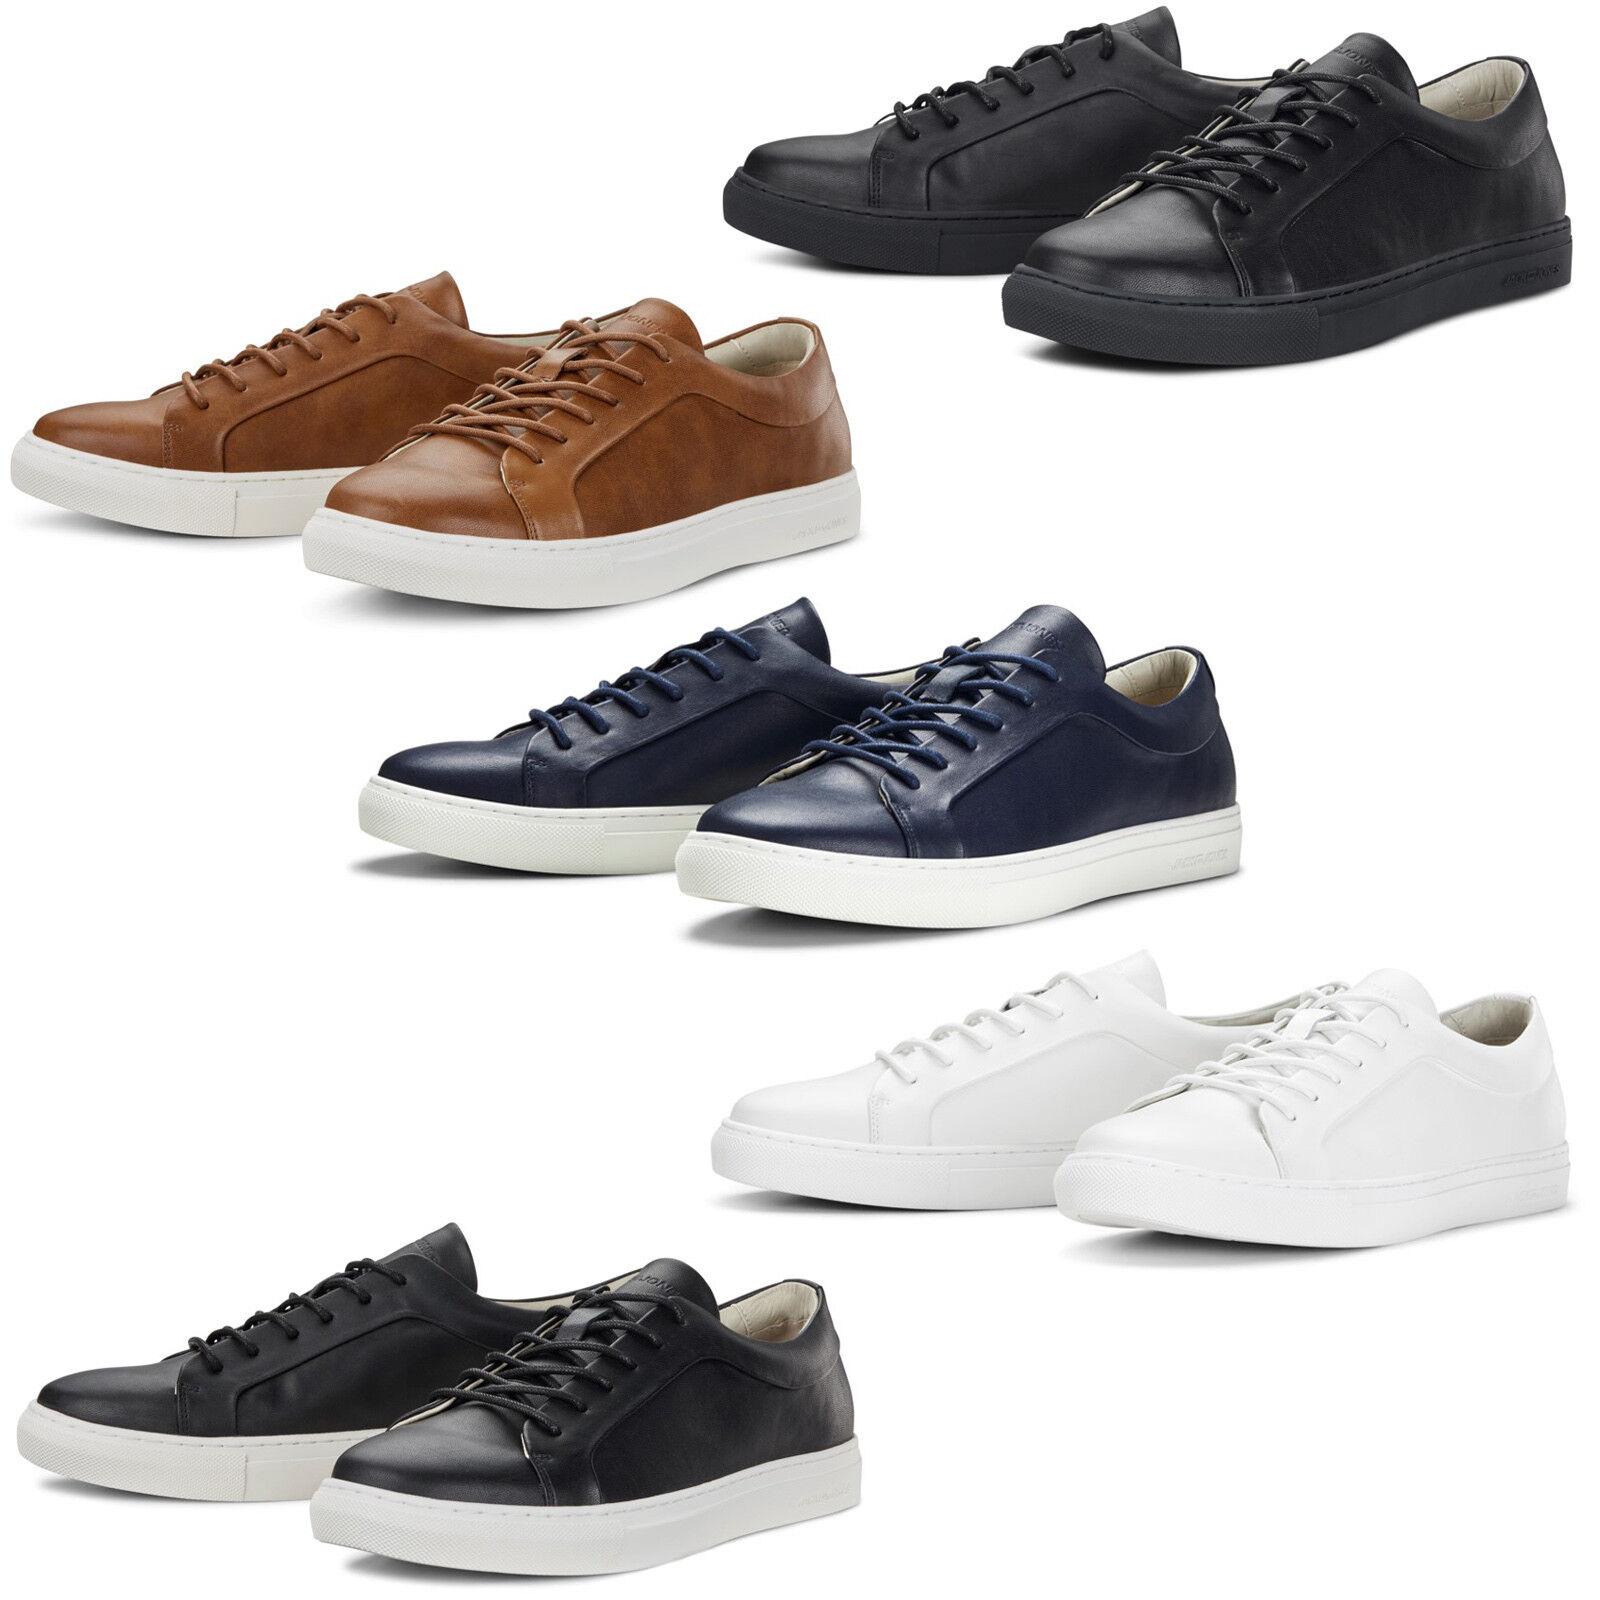 Jack & Jones Sputnik Entrenadores Zapatos Tenis de Planas Moda de Hombre Clásicas Planas de bombas 3b9587